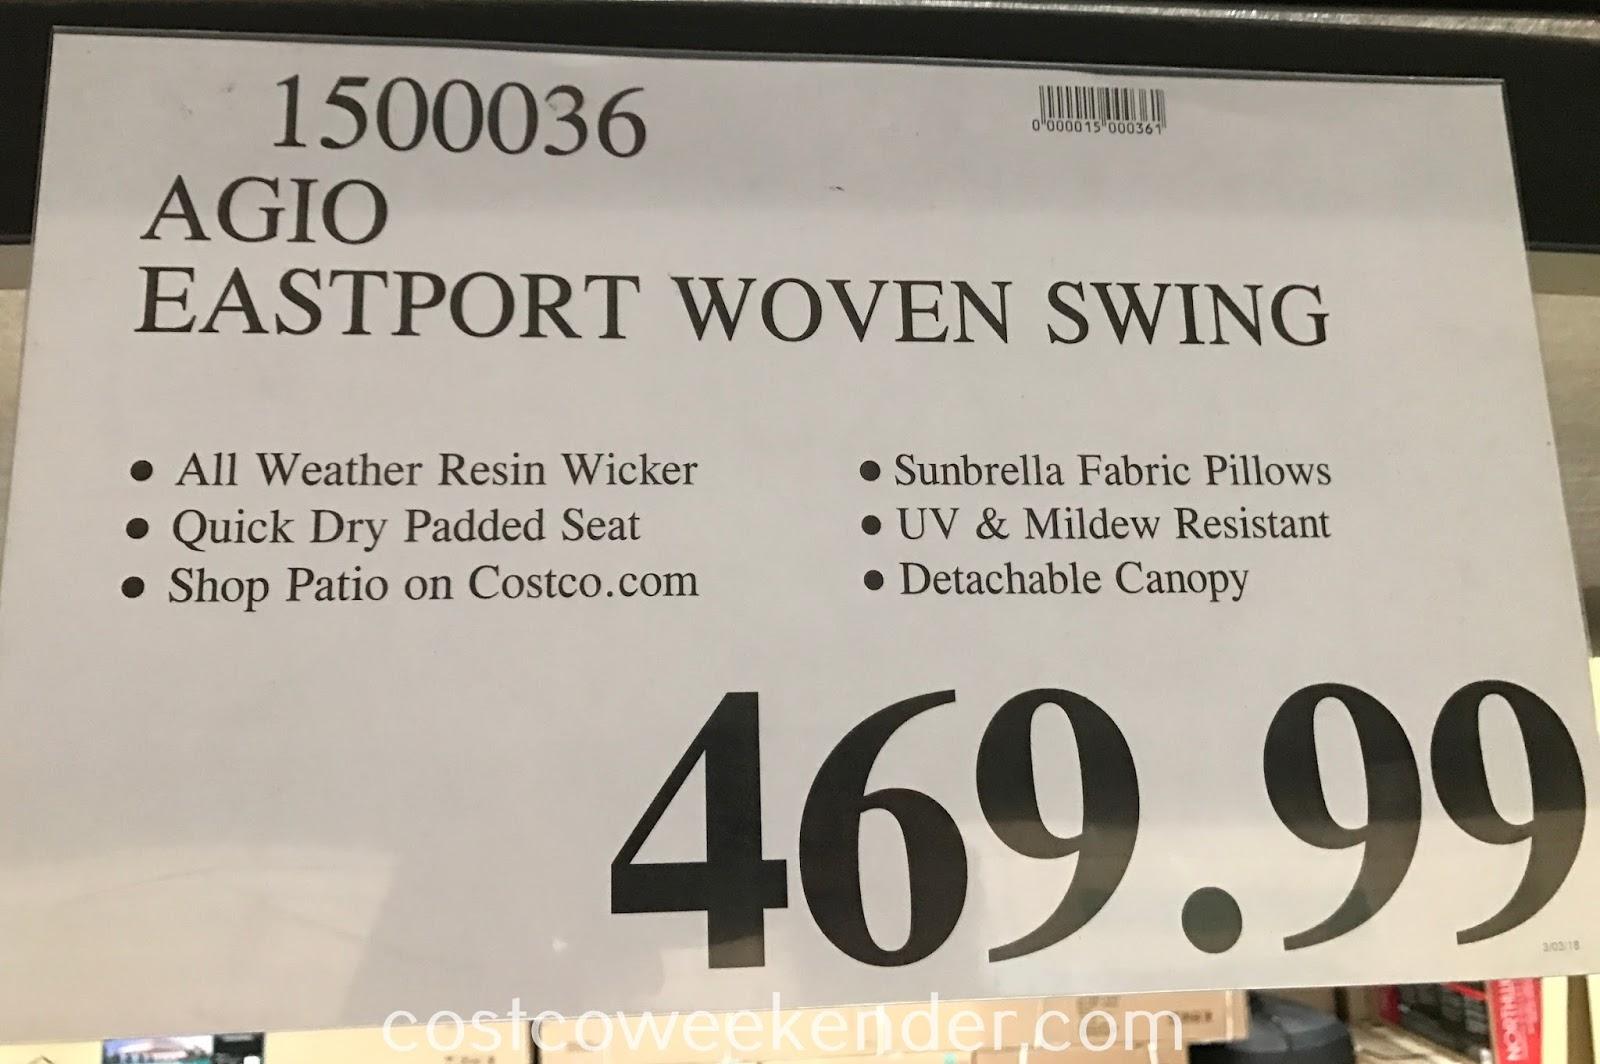 Agio Eastport Woven Swing  Costco Weekender